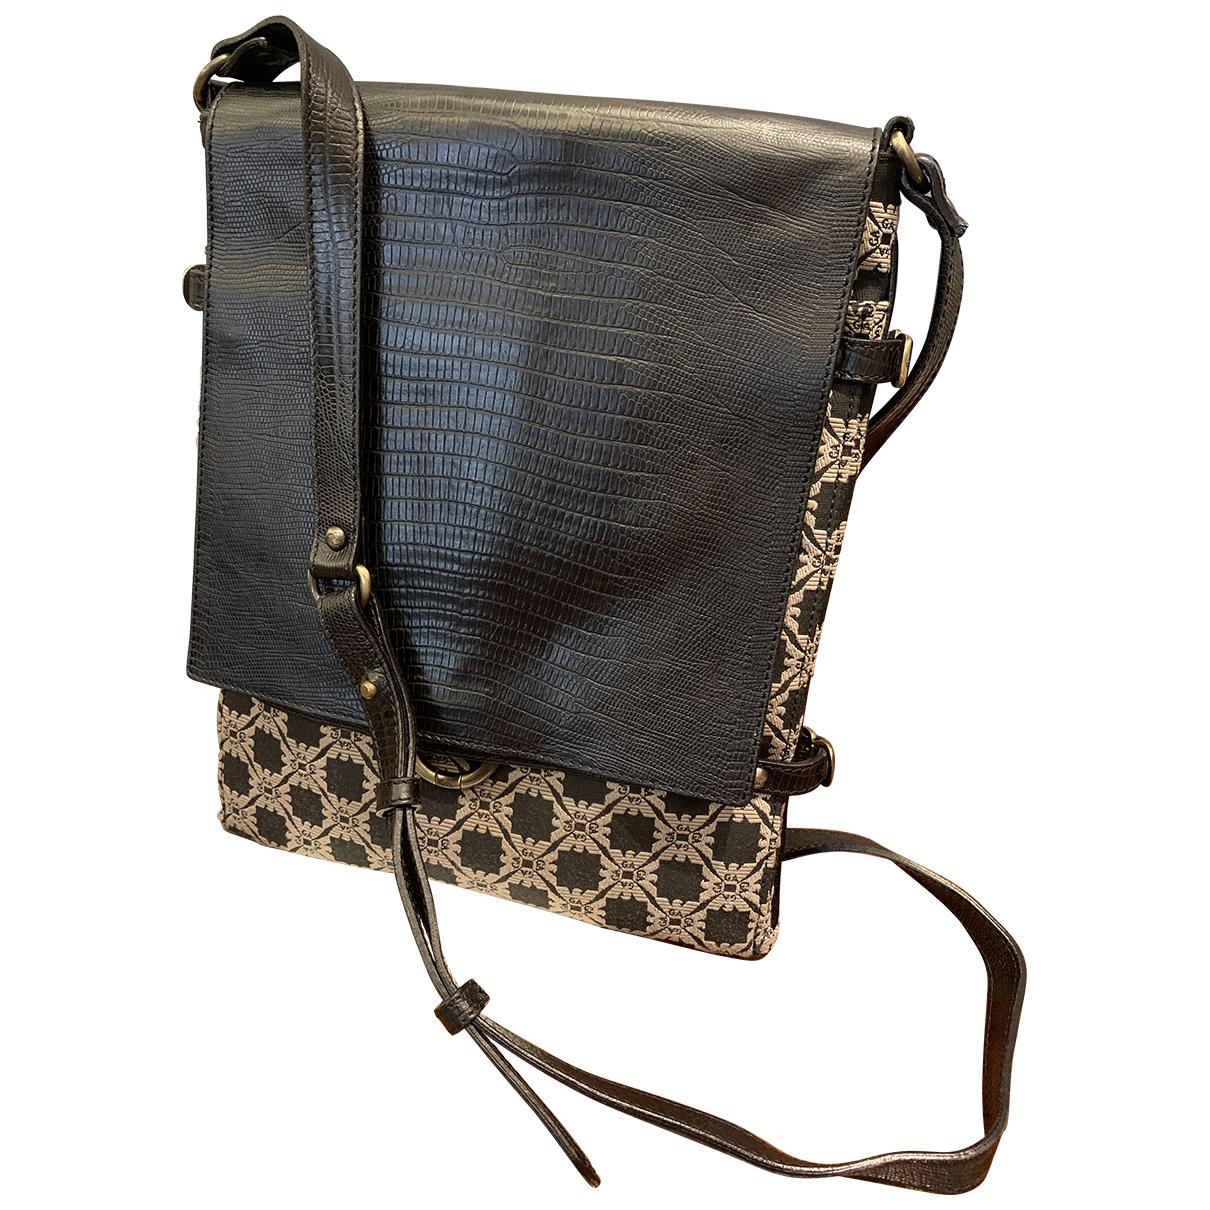 Emporio Armani \N Cloth handbag for Women \N